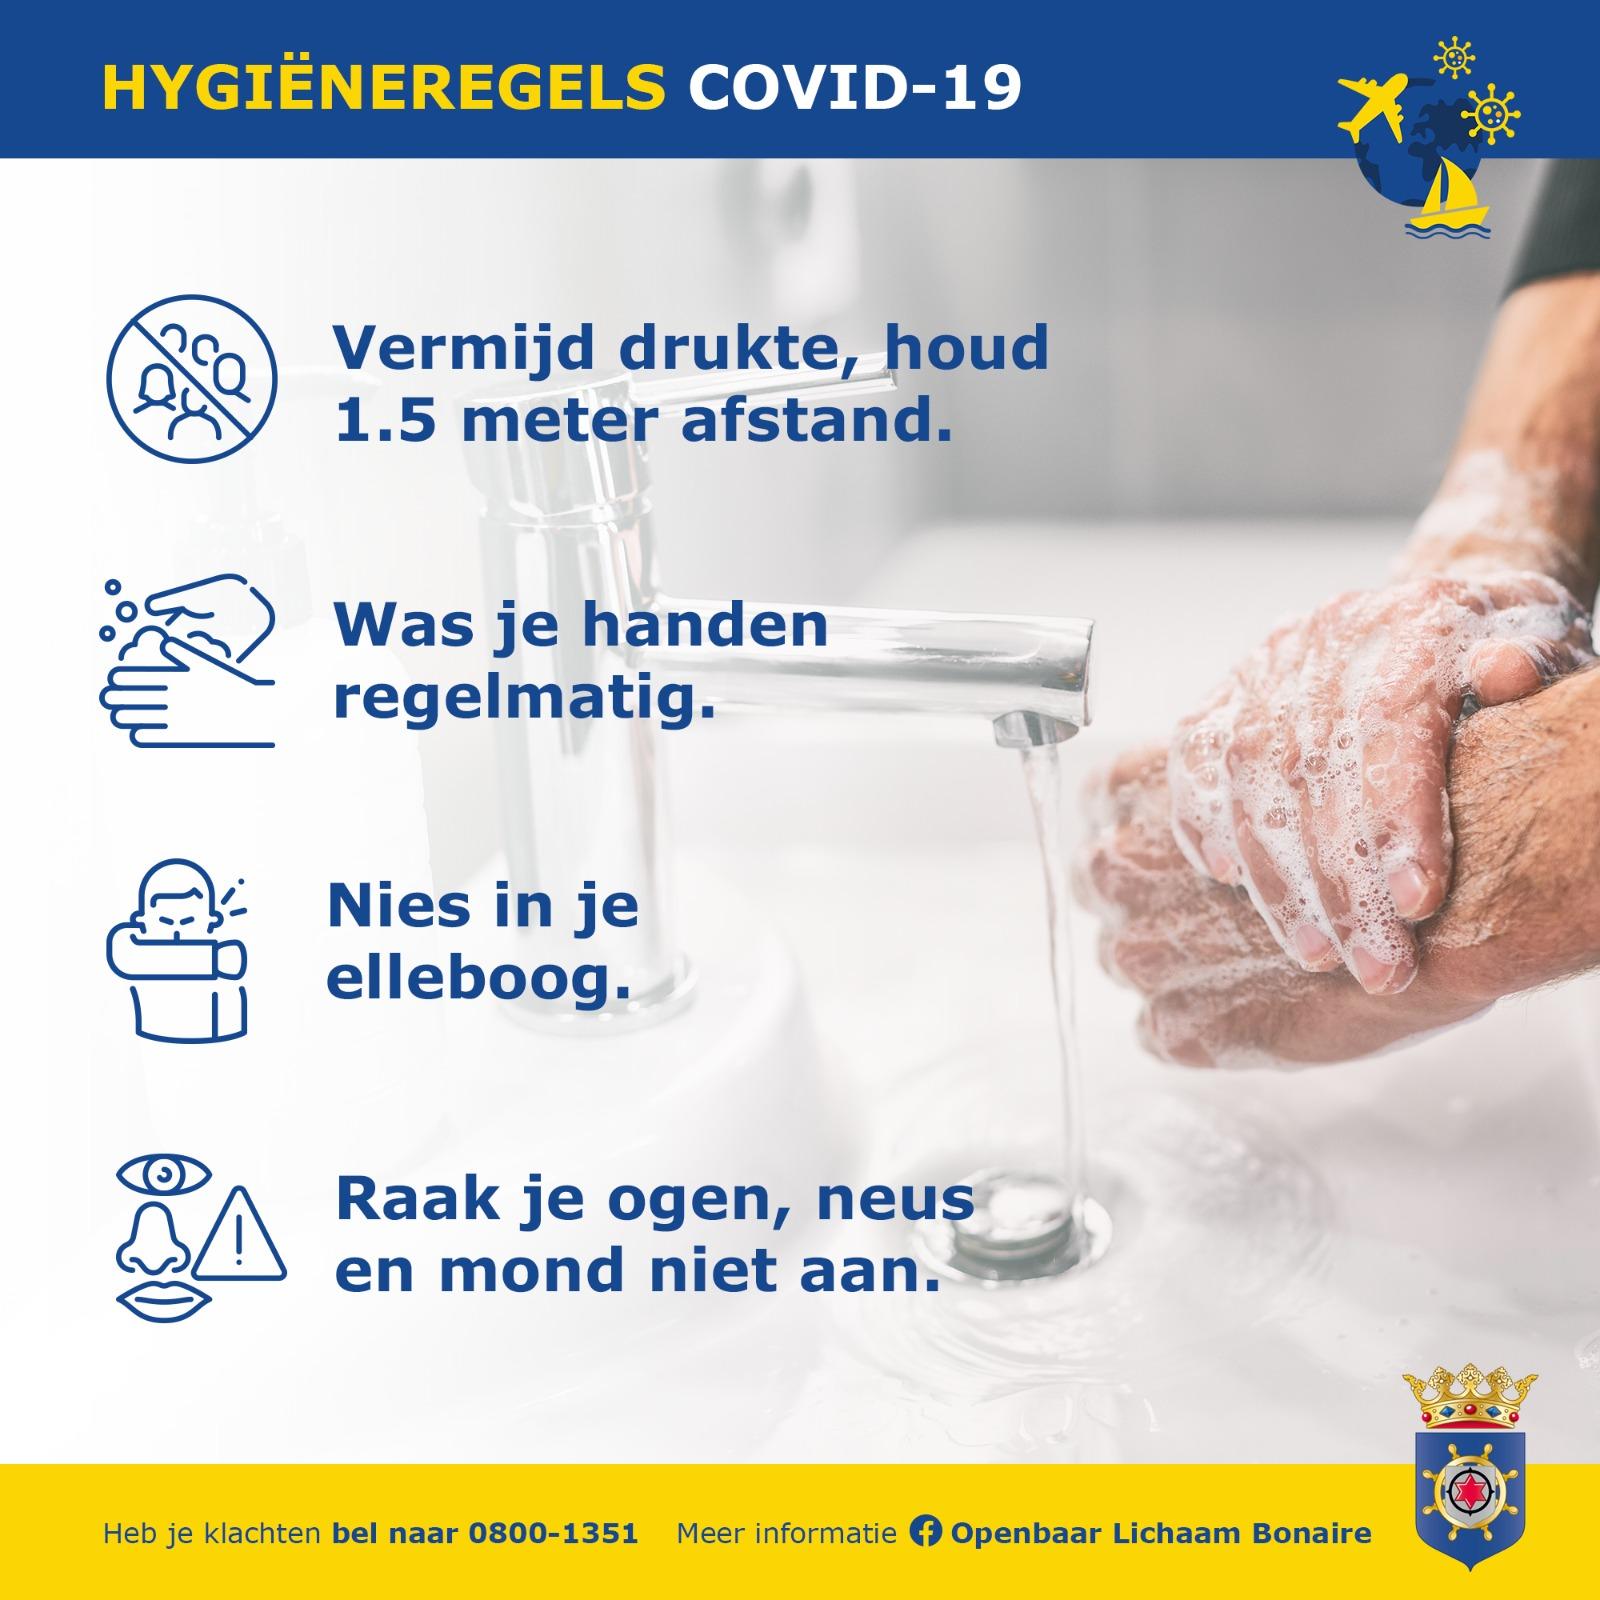 20200701 - Hygieneregels